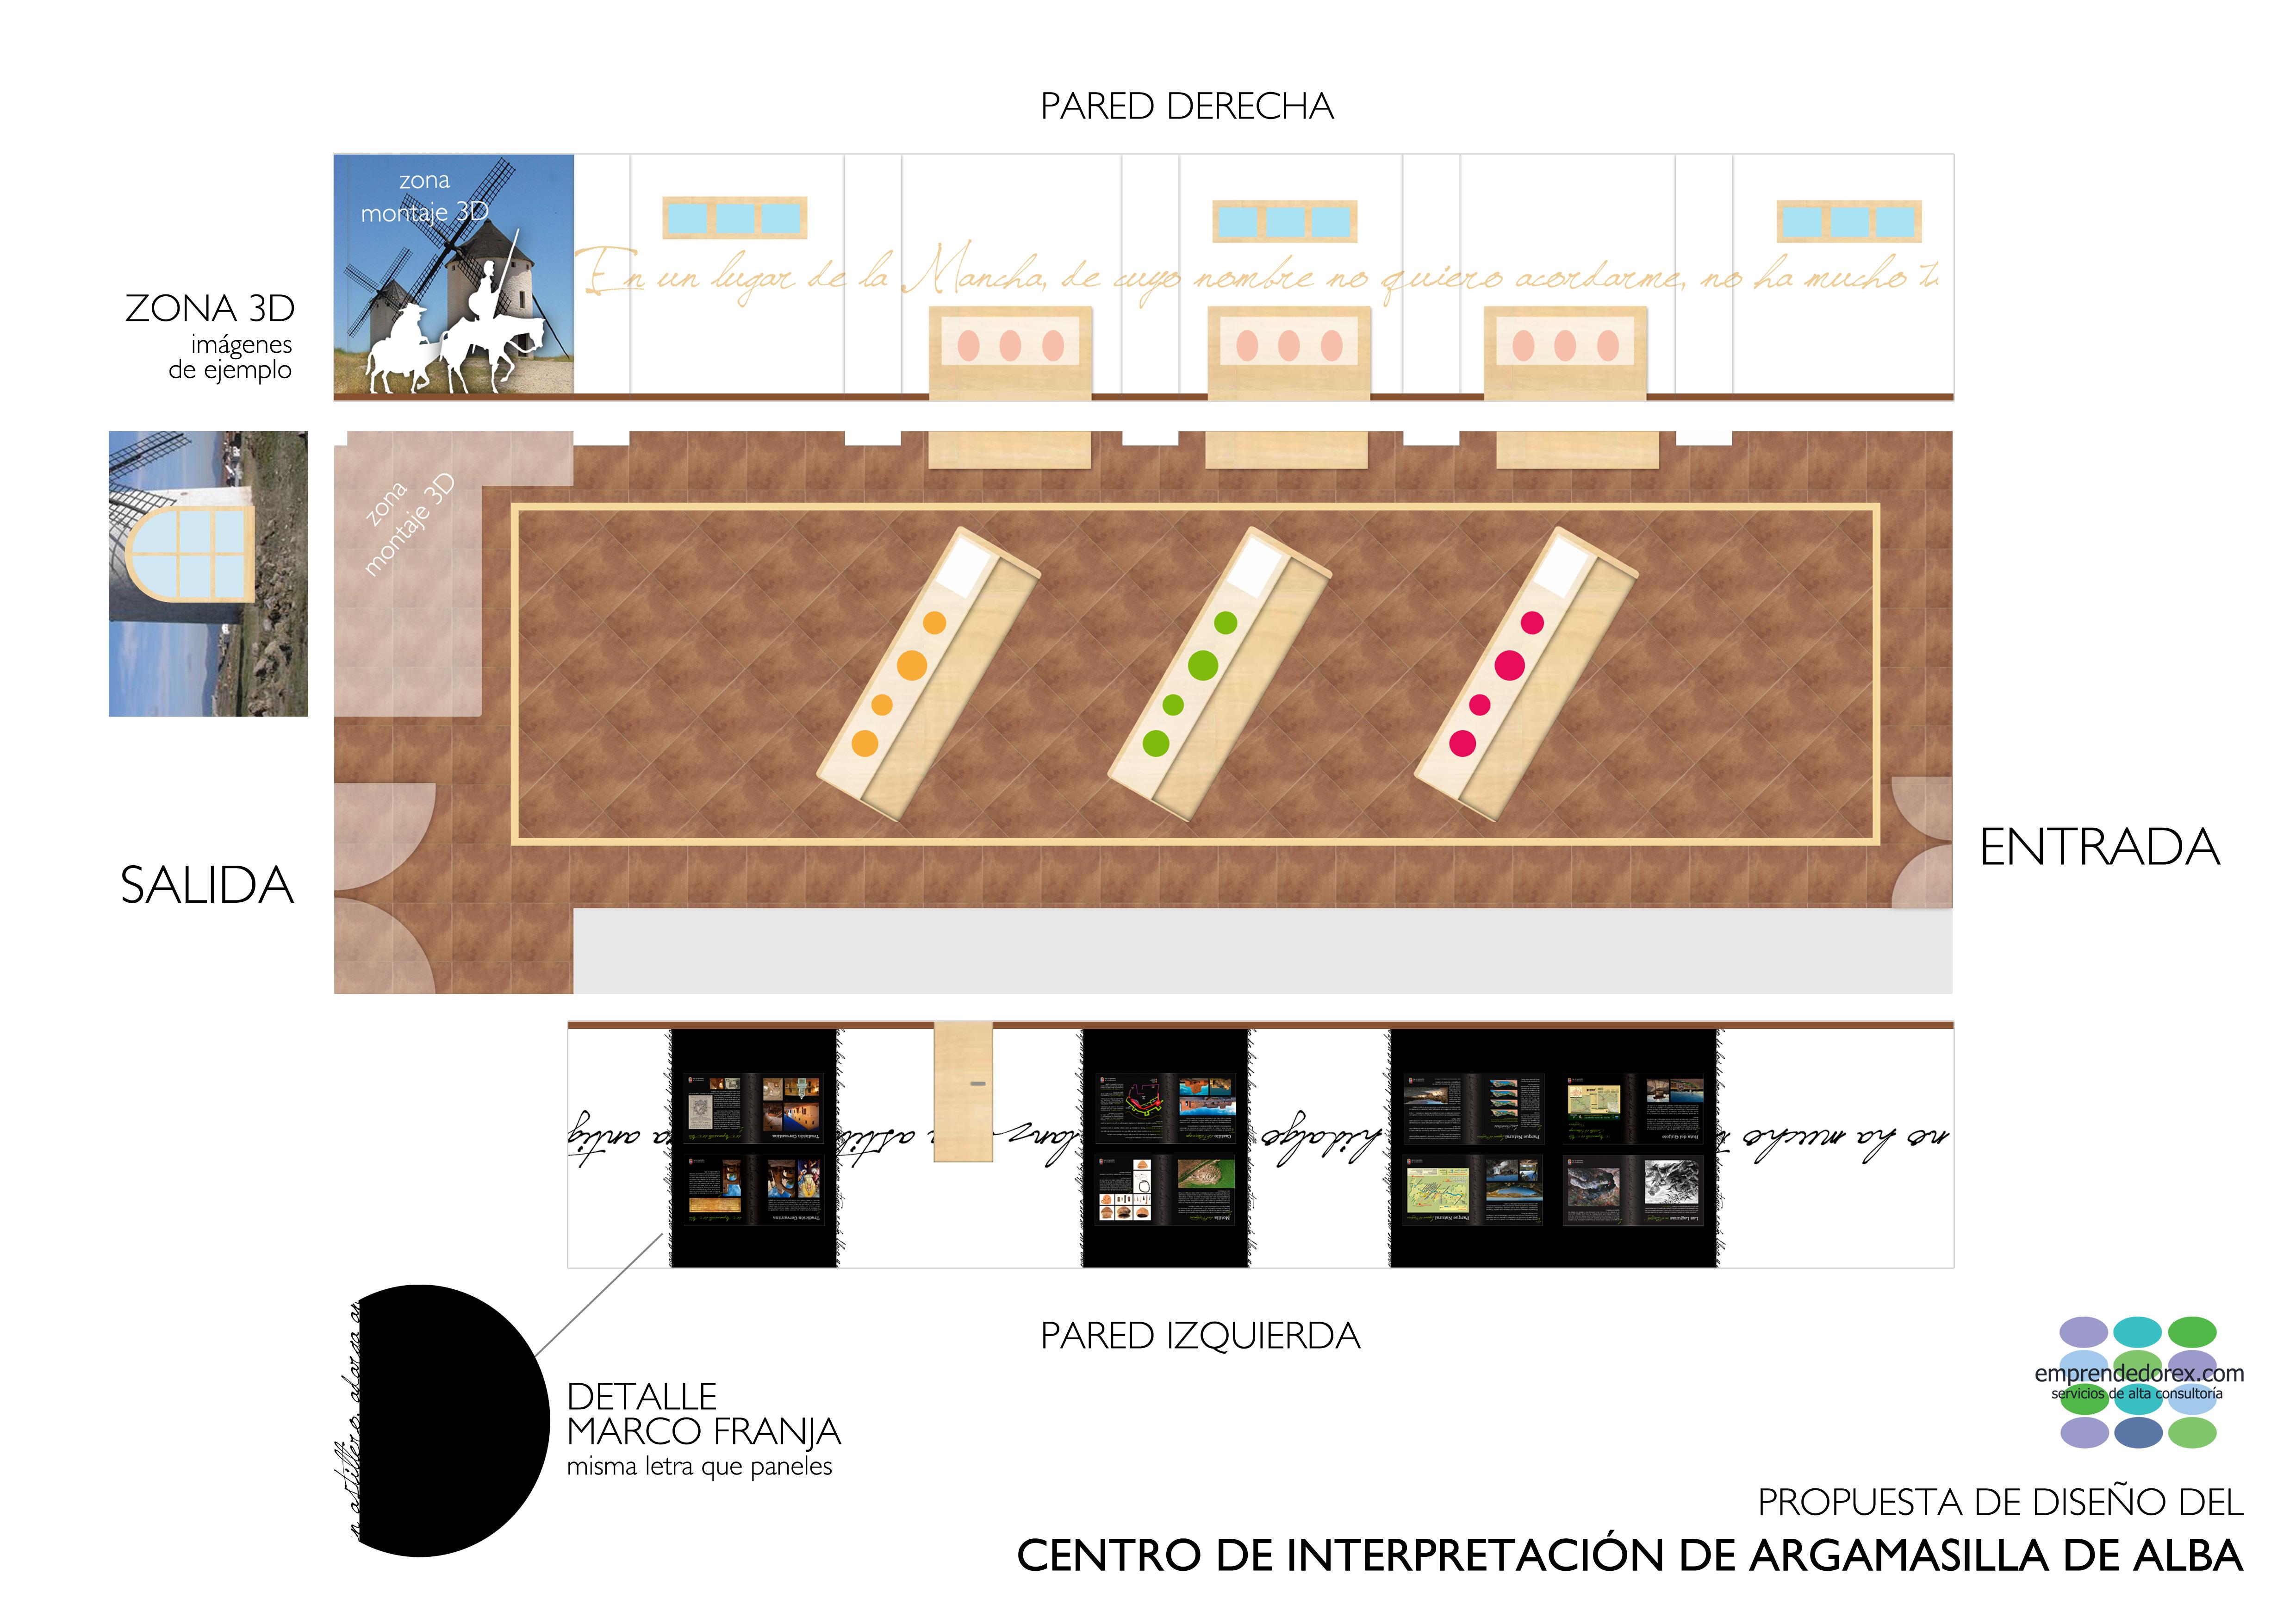 A3-propuesta-centro